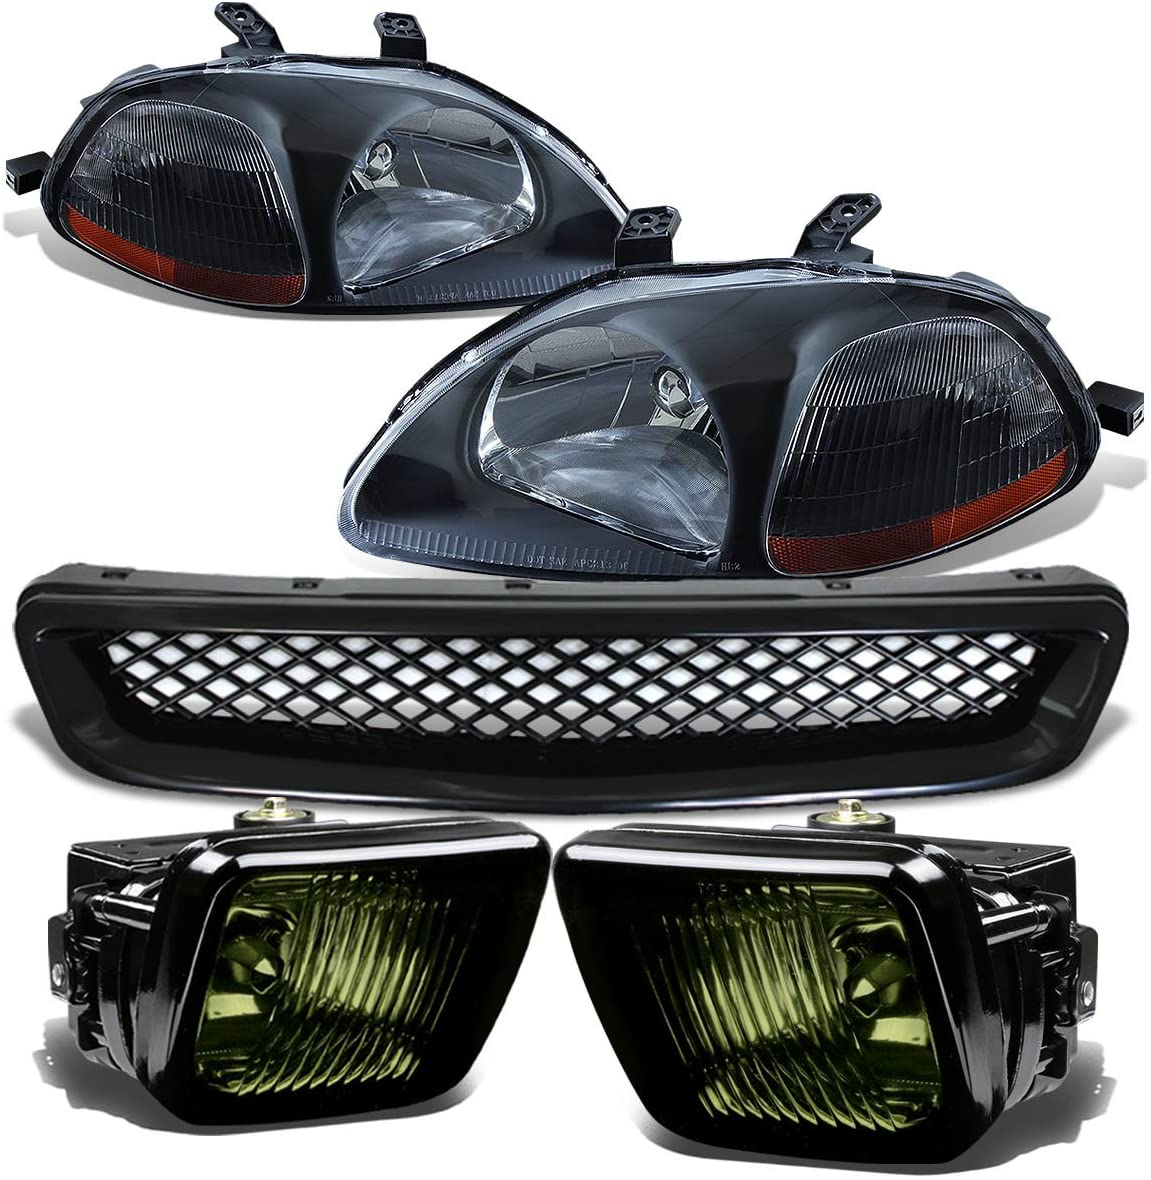 Replacement for Honda Civic Headlight (Black)+Bumper Fog Light (Smoke Lens)+Grille - 6th Generation EJ EM EK D16